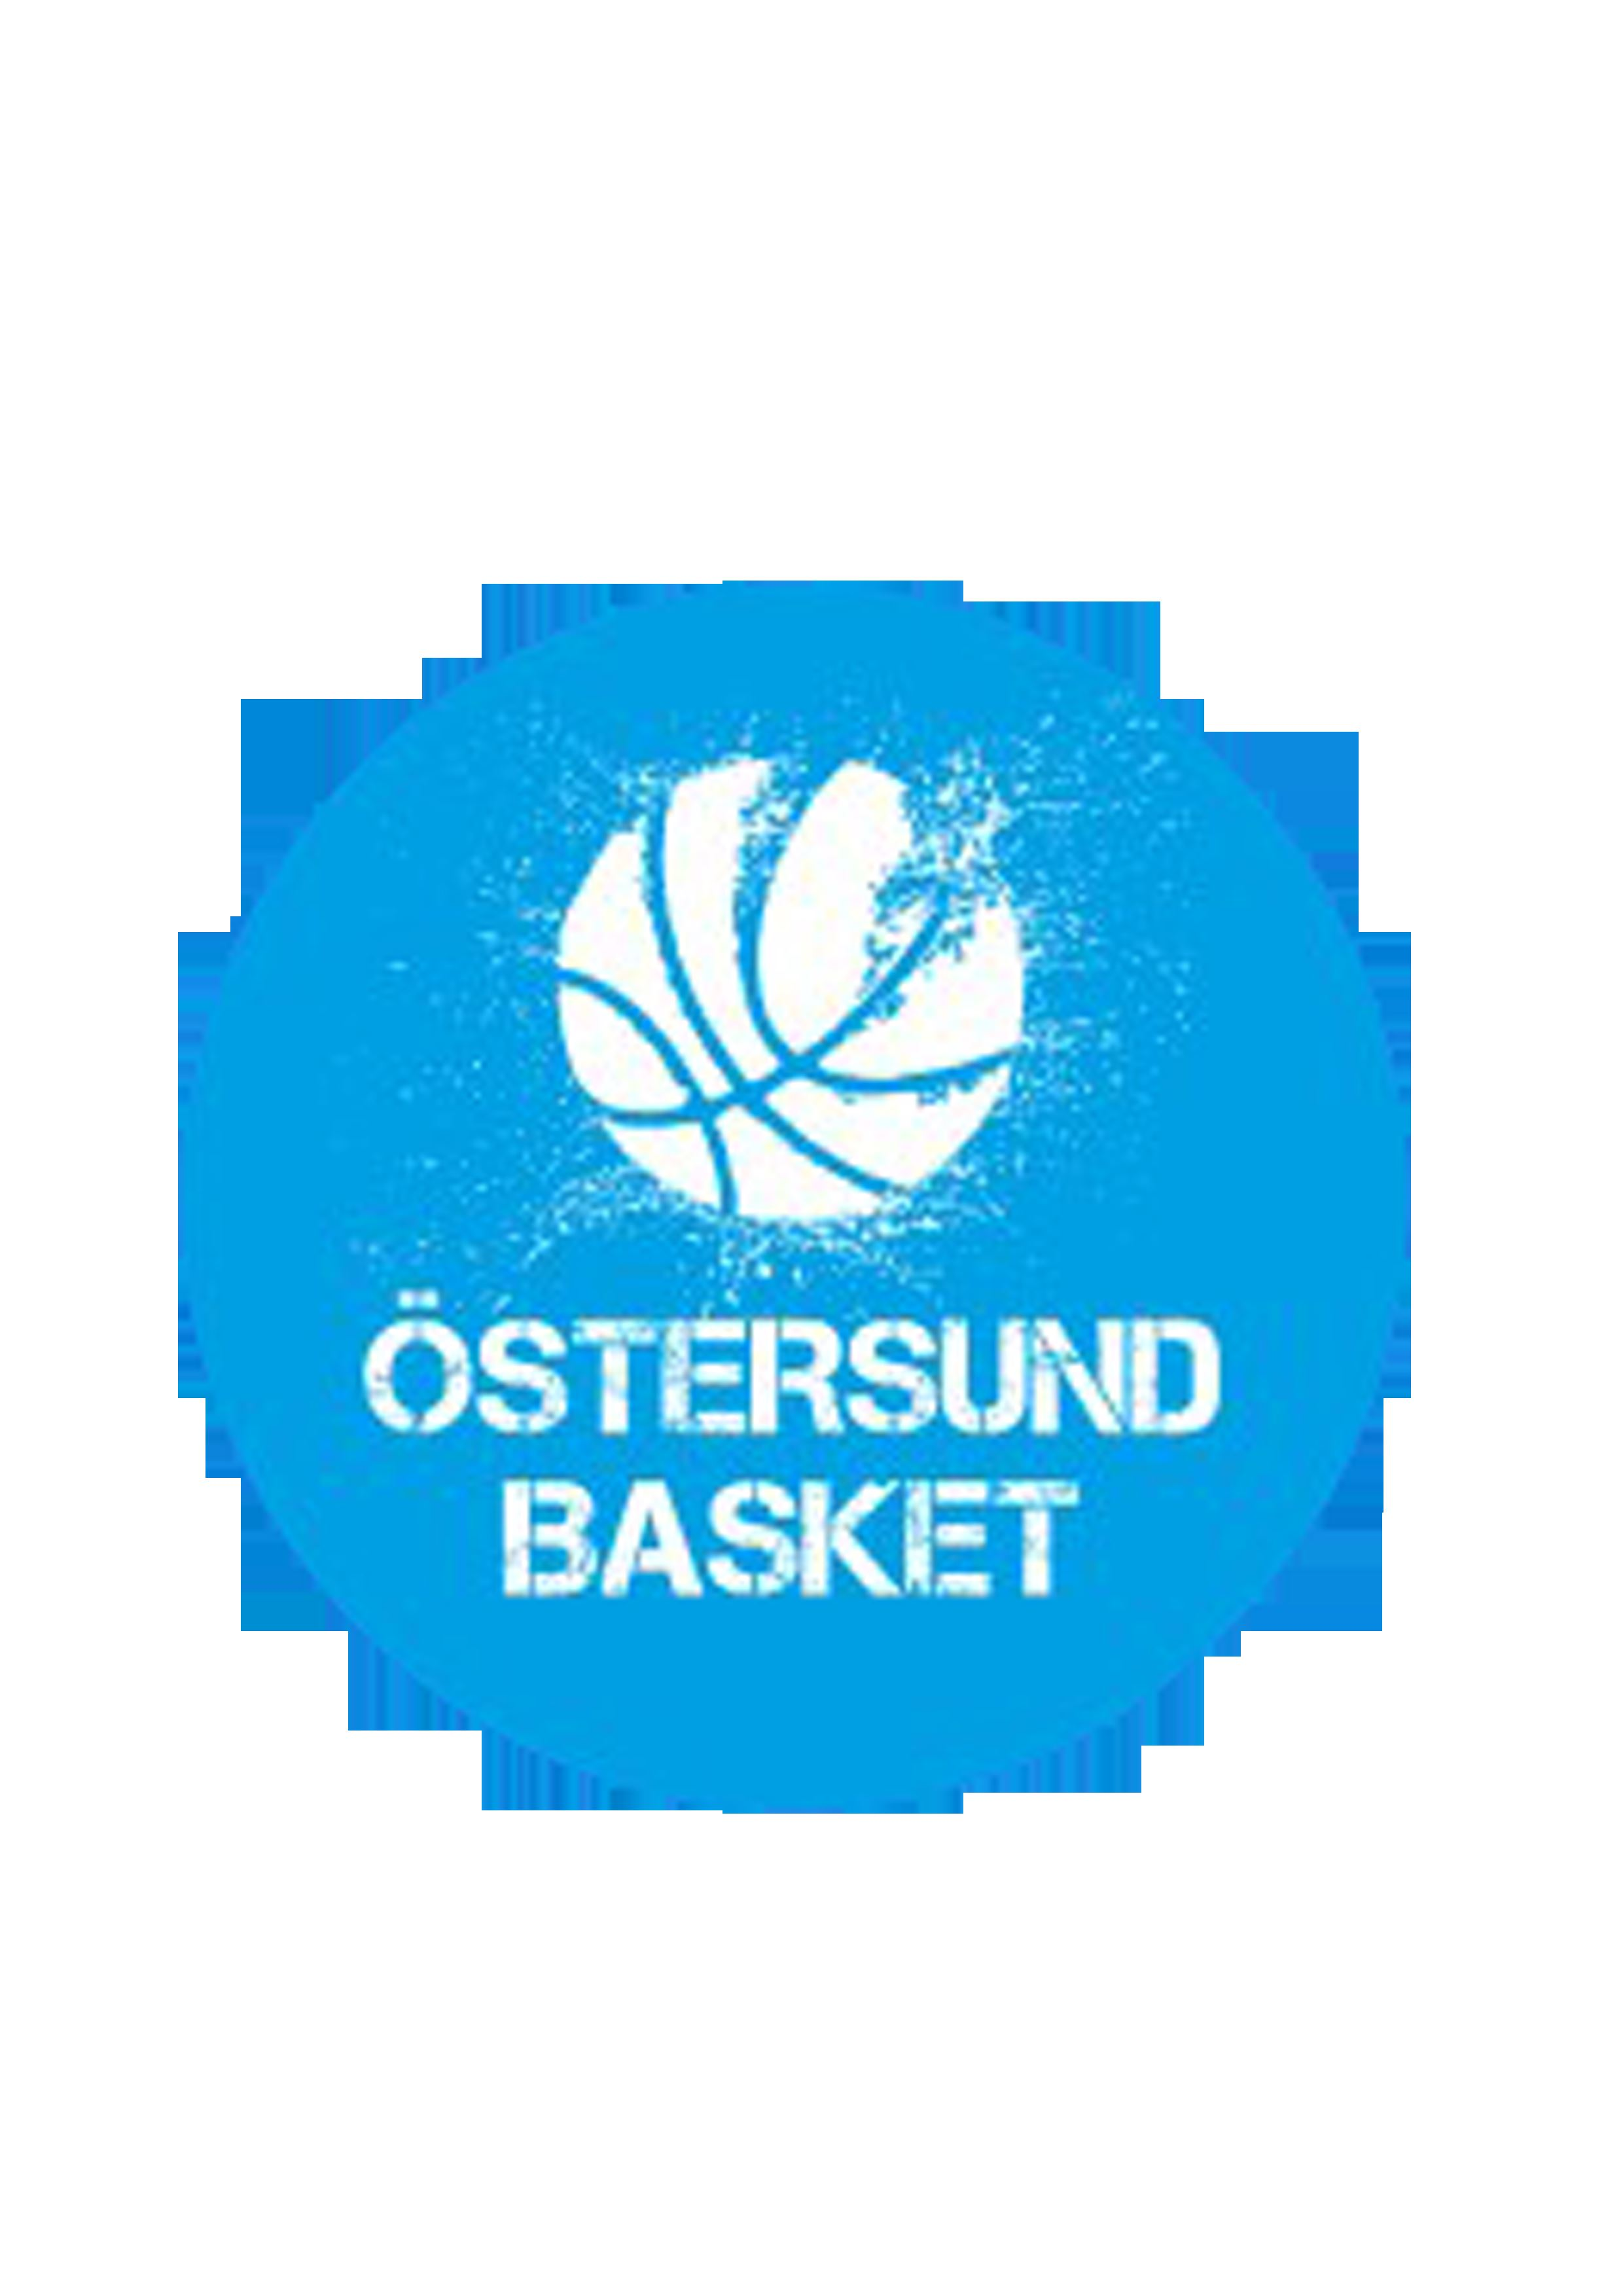 Östersund Basket vs KFUM Uppsala